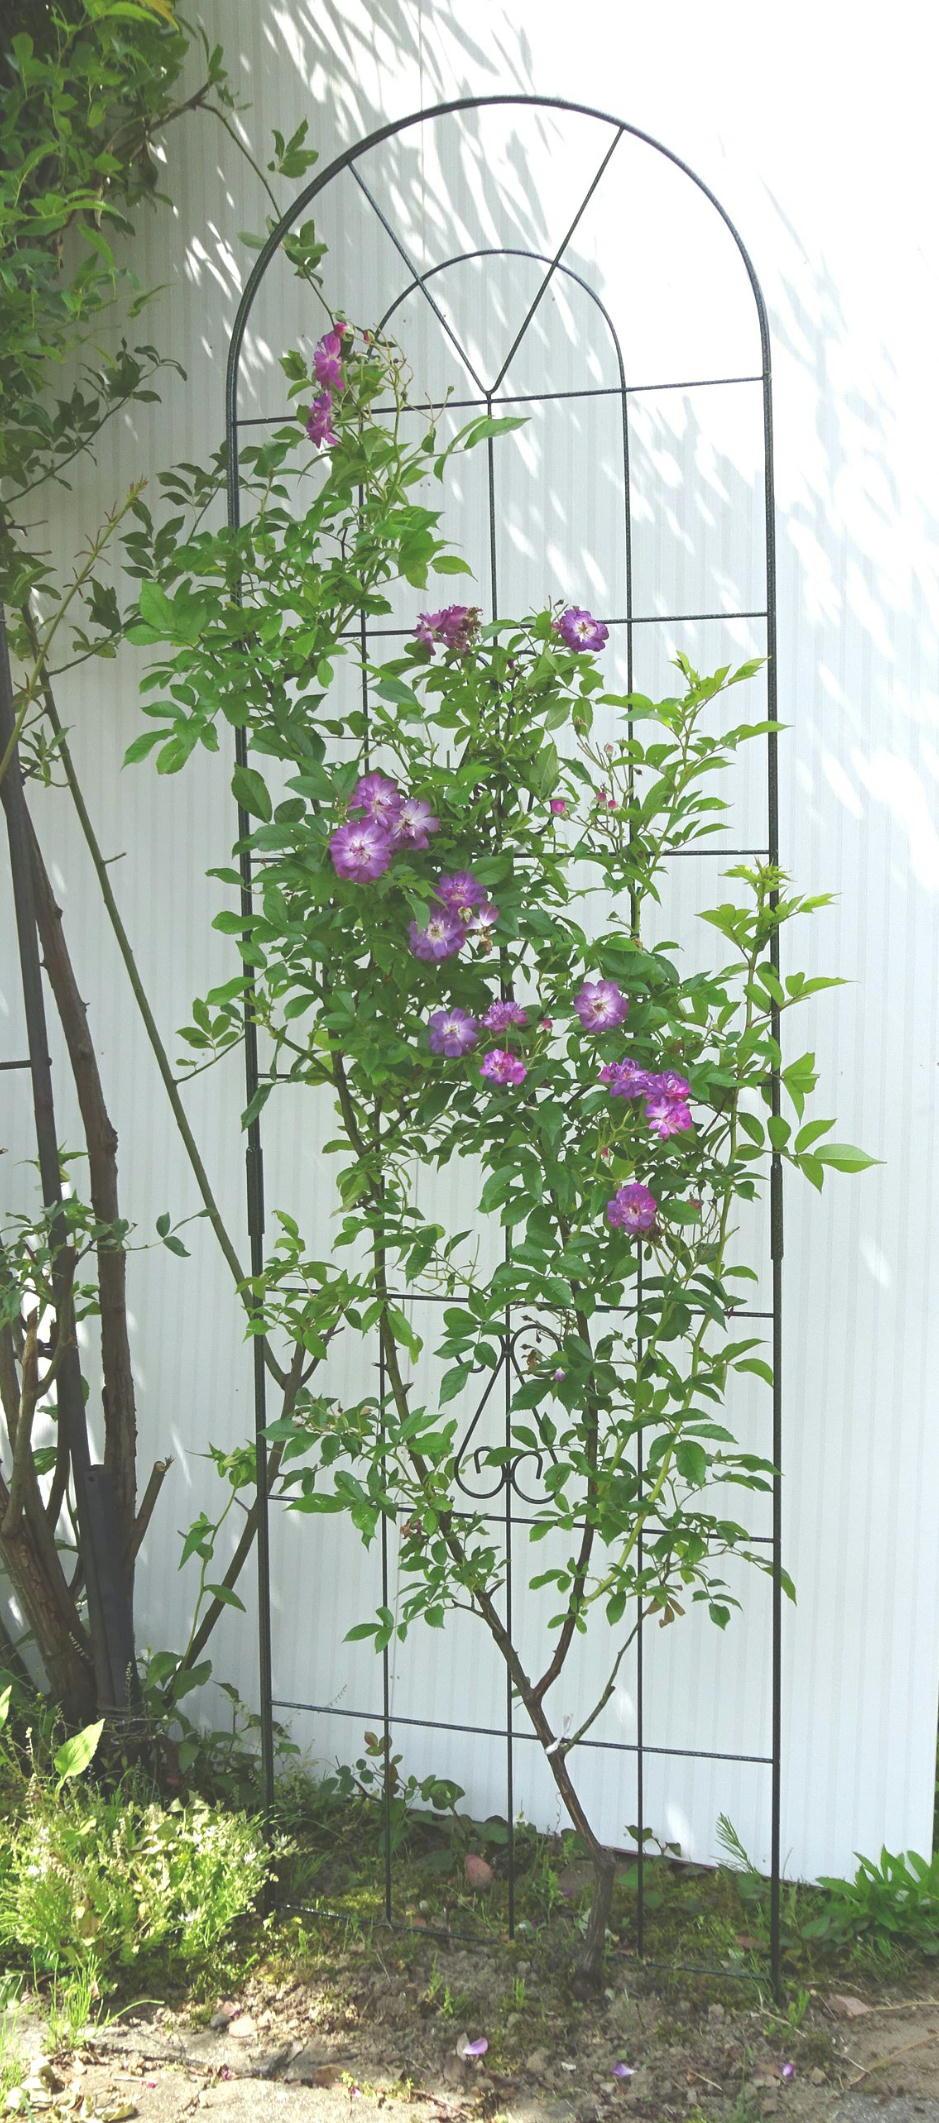 http://gr-garden.com/183-image1.jpg